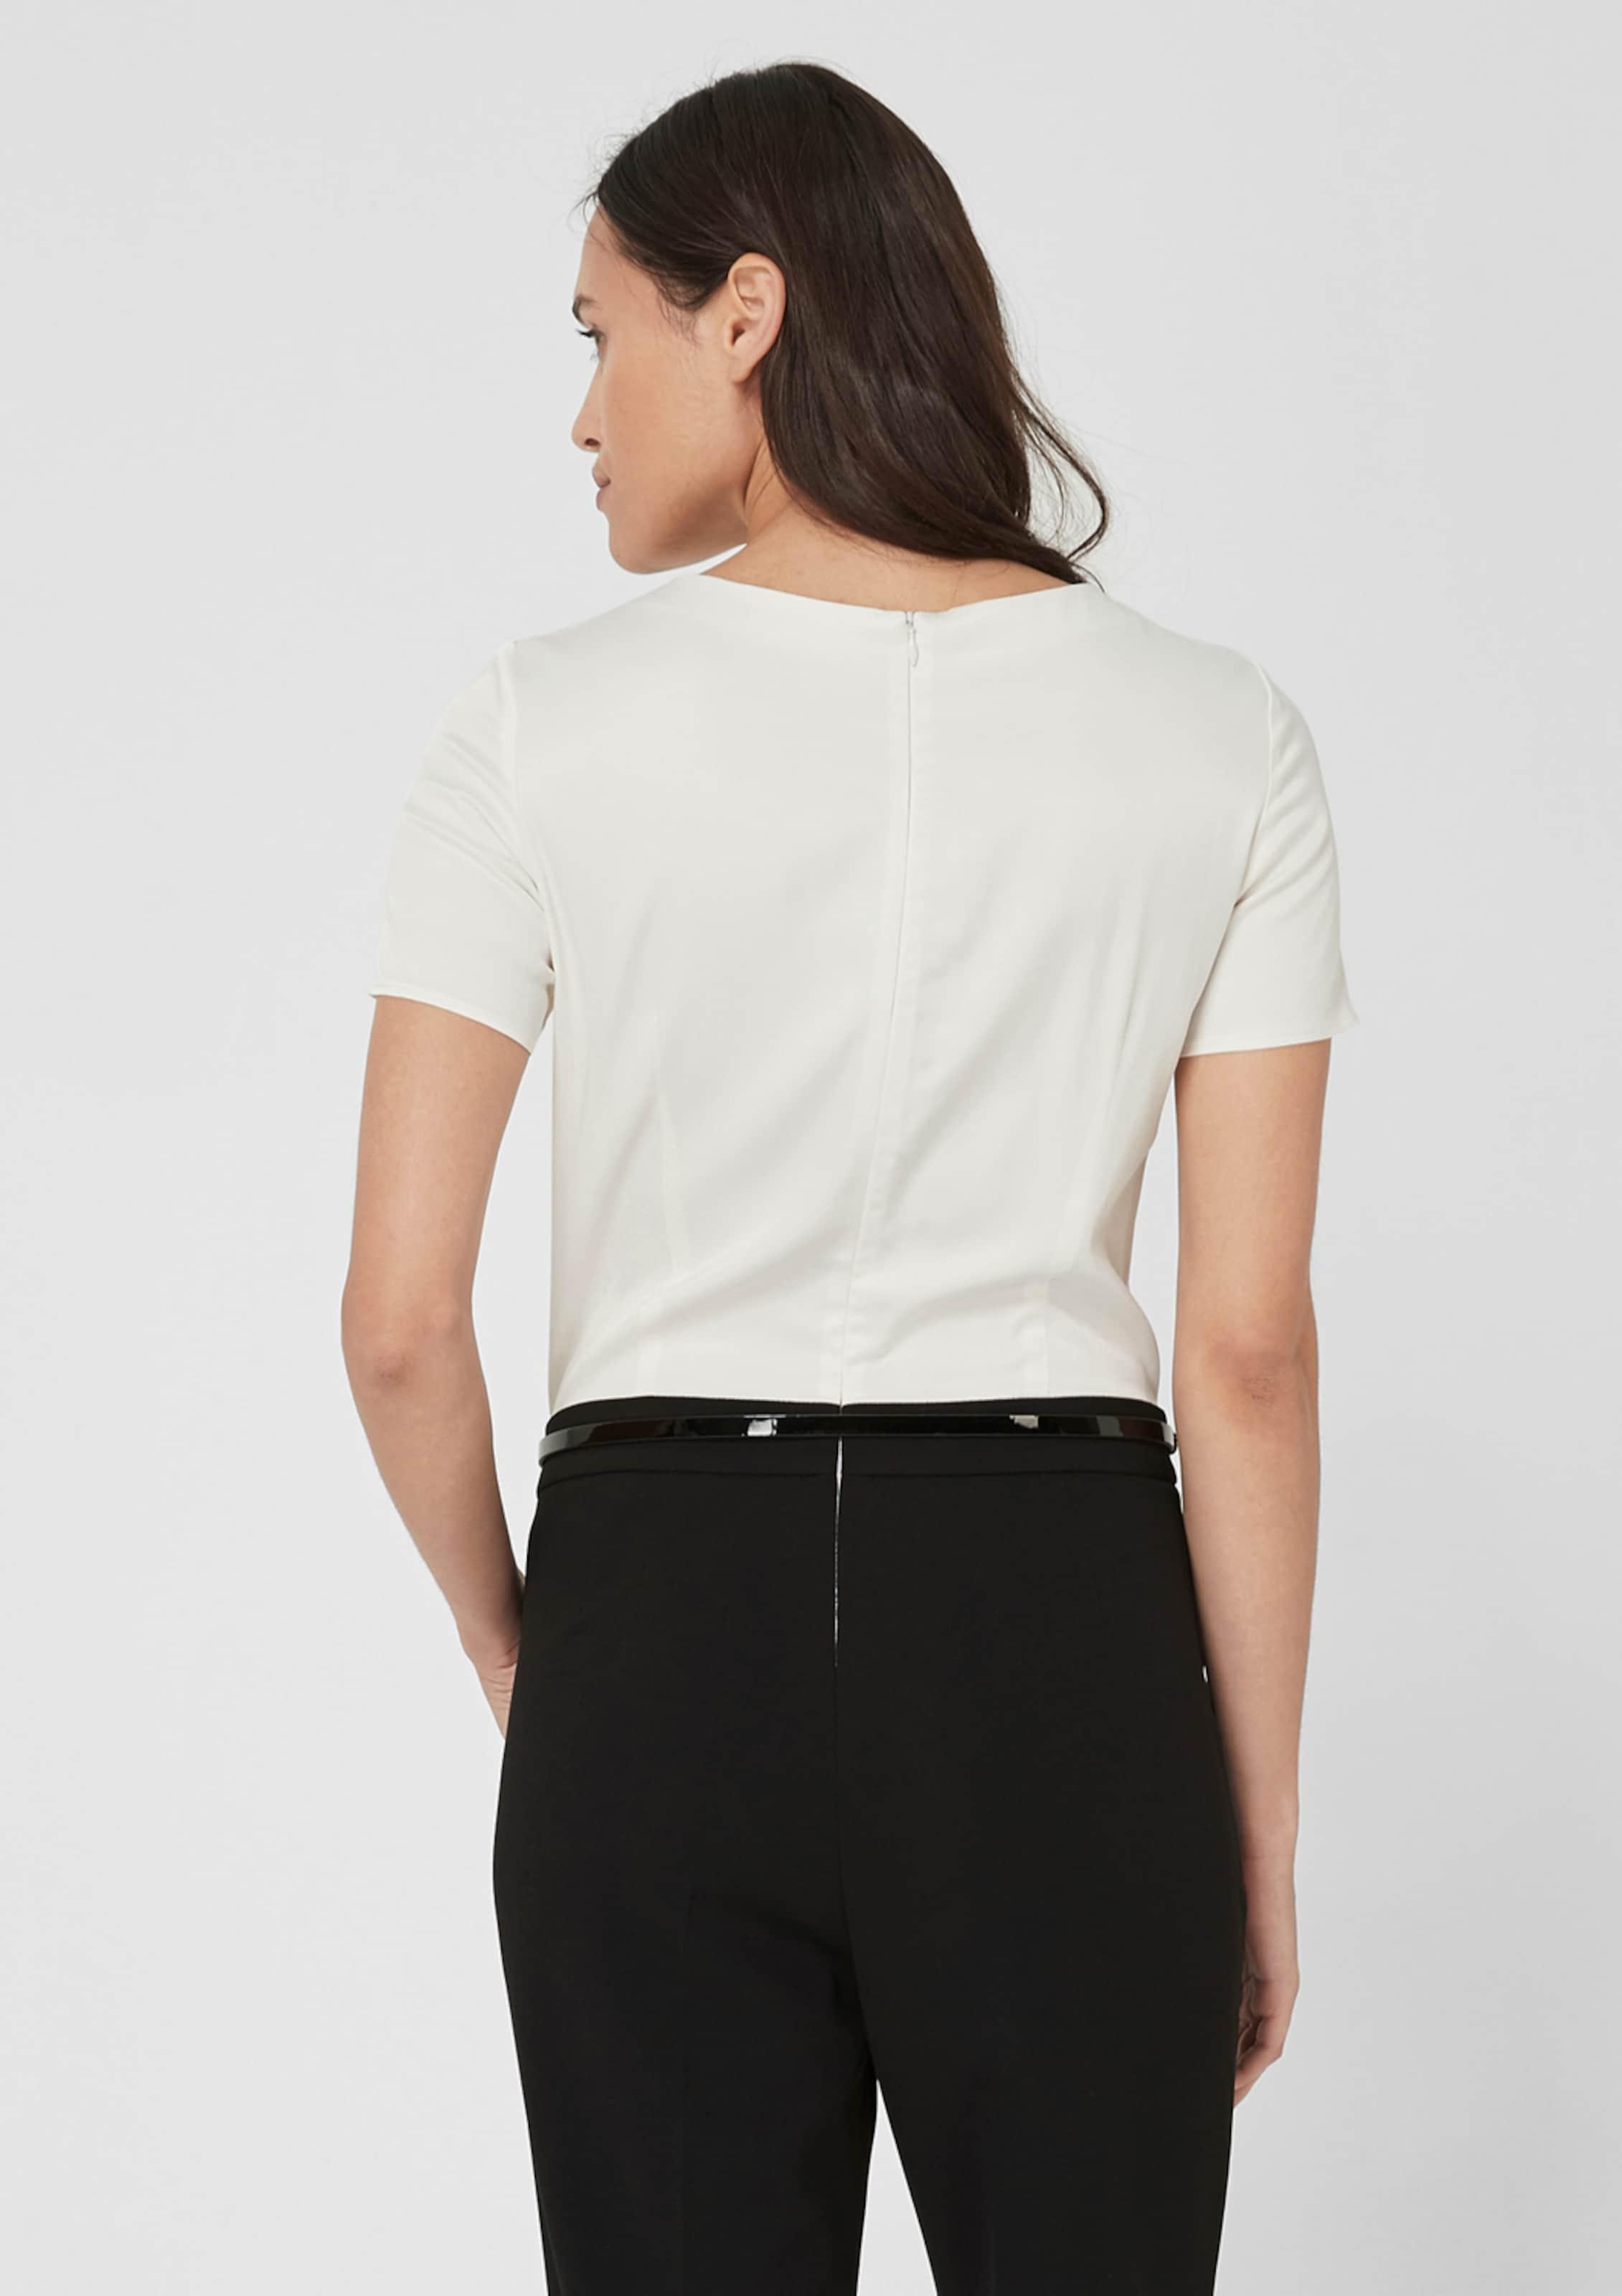 SchwarzWeiß In oliver Label S Jumpsuit Black CxrosthQdB